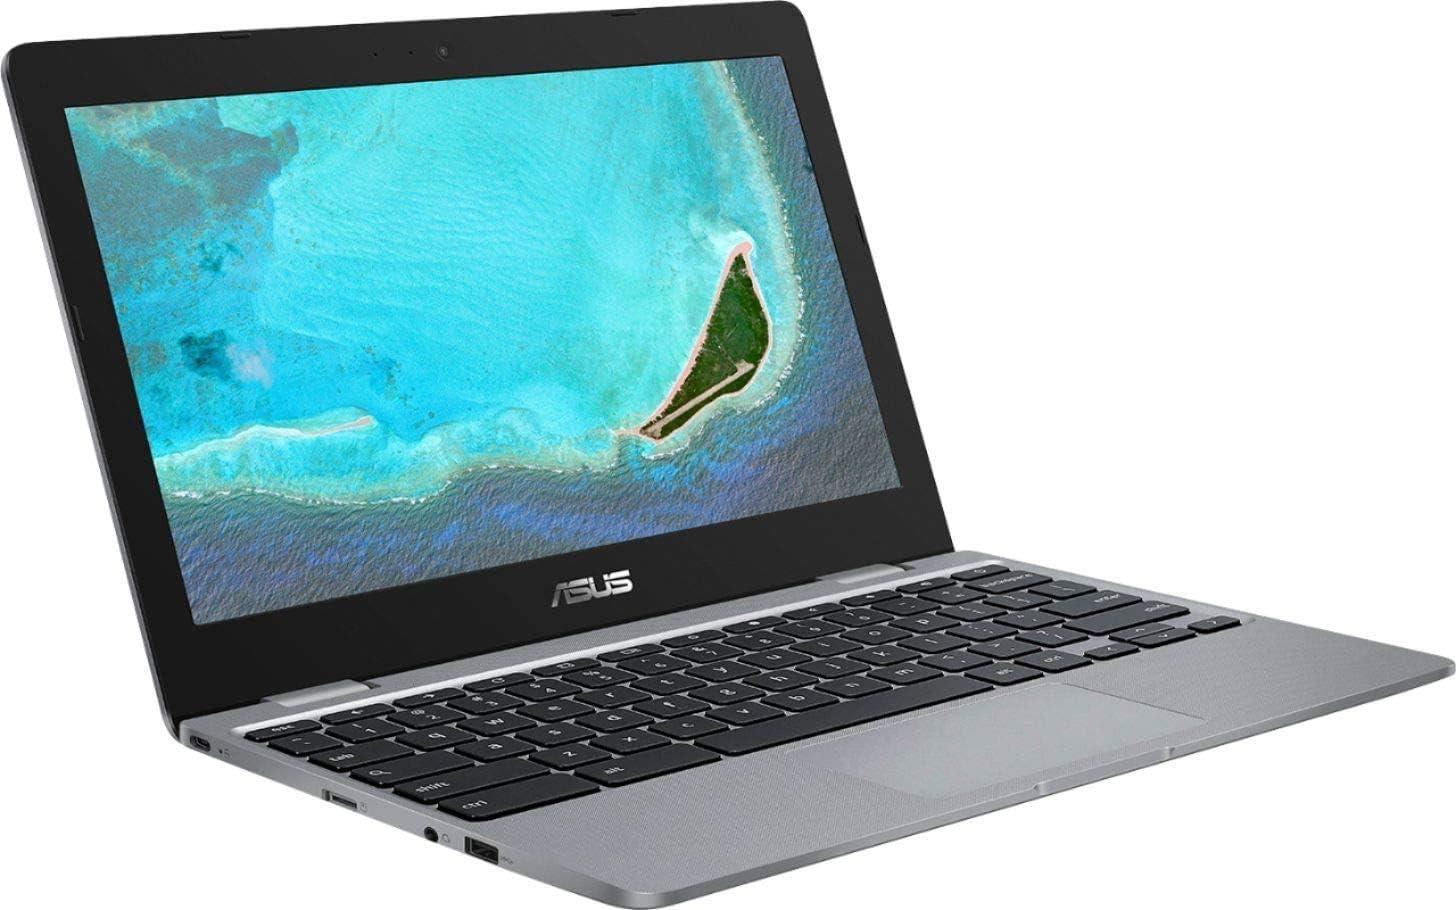 2020 Newest Asus Chromebook 11.6 Inch Online Class Reday Laptop, Intel Celeron N3350 up to 2.4 GHz, 4GB RAM, 16GB eMMC, WiFi, Bluetooth, Webcam, Chrome OS + AllyFlex Mousepad